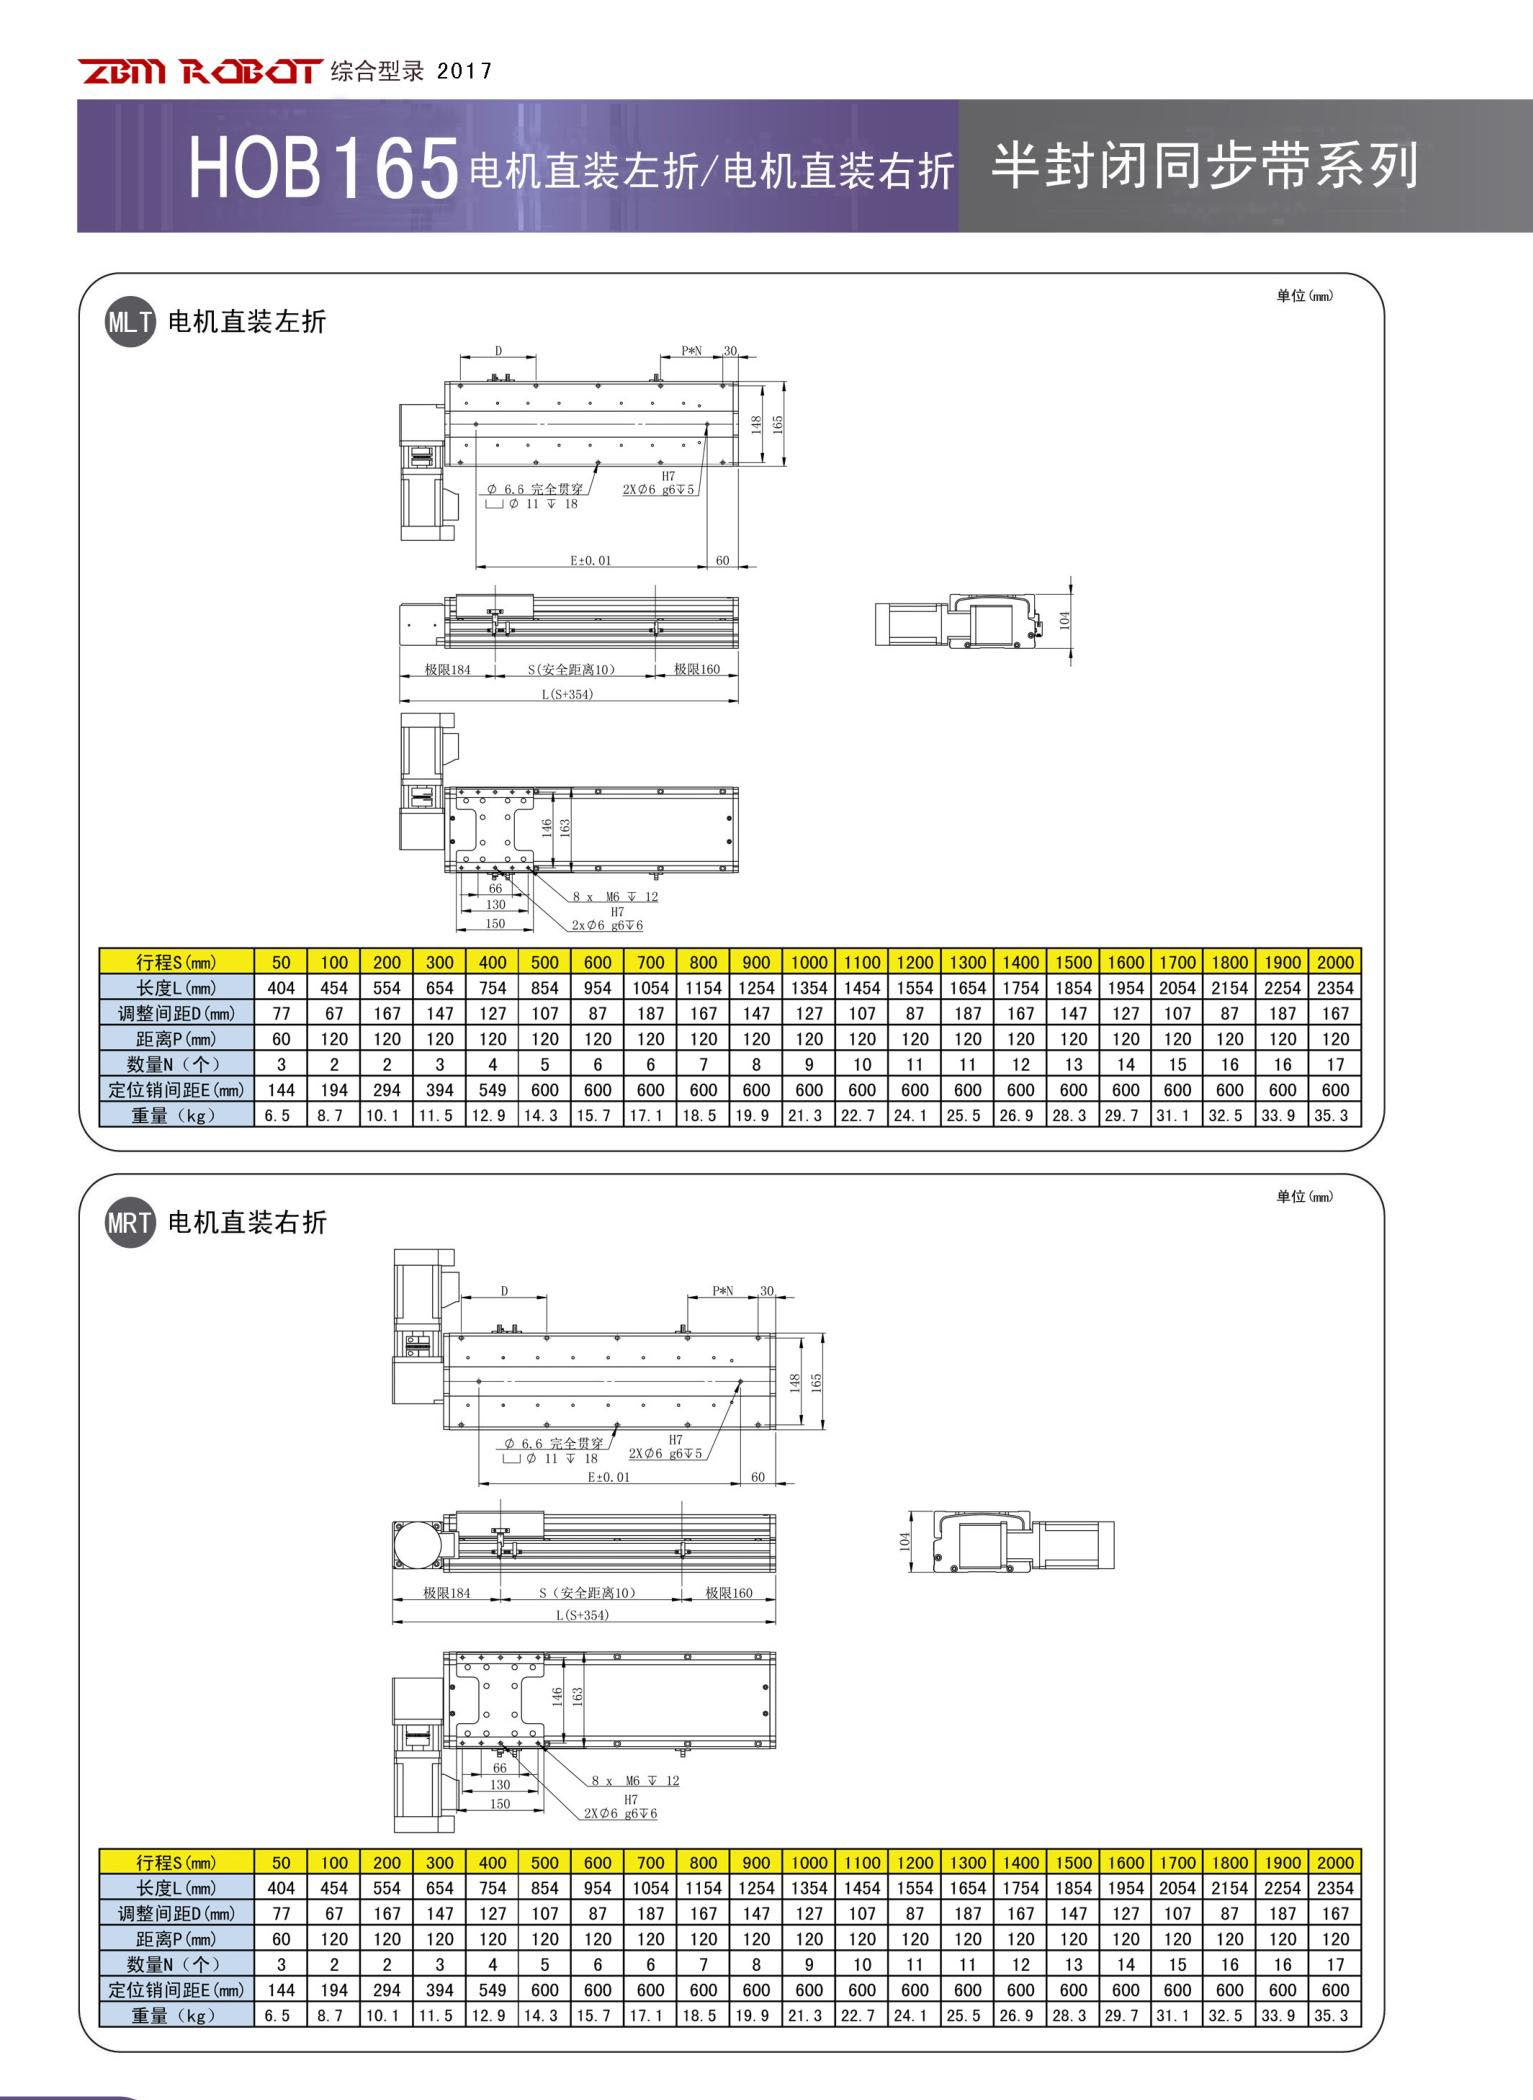 HOB165B-CM|半封闭皮带模组-深圳市桃花app下载特别黄的智能装备有限公司